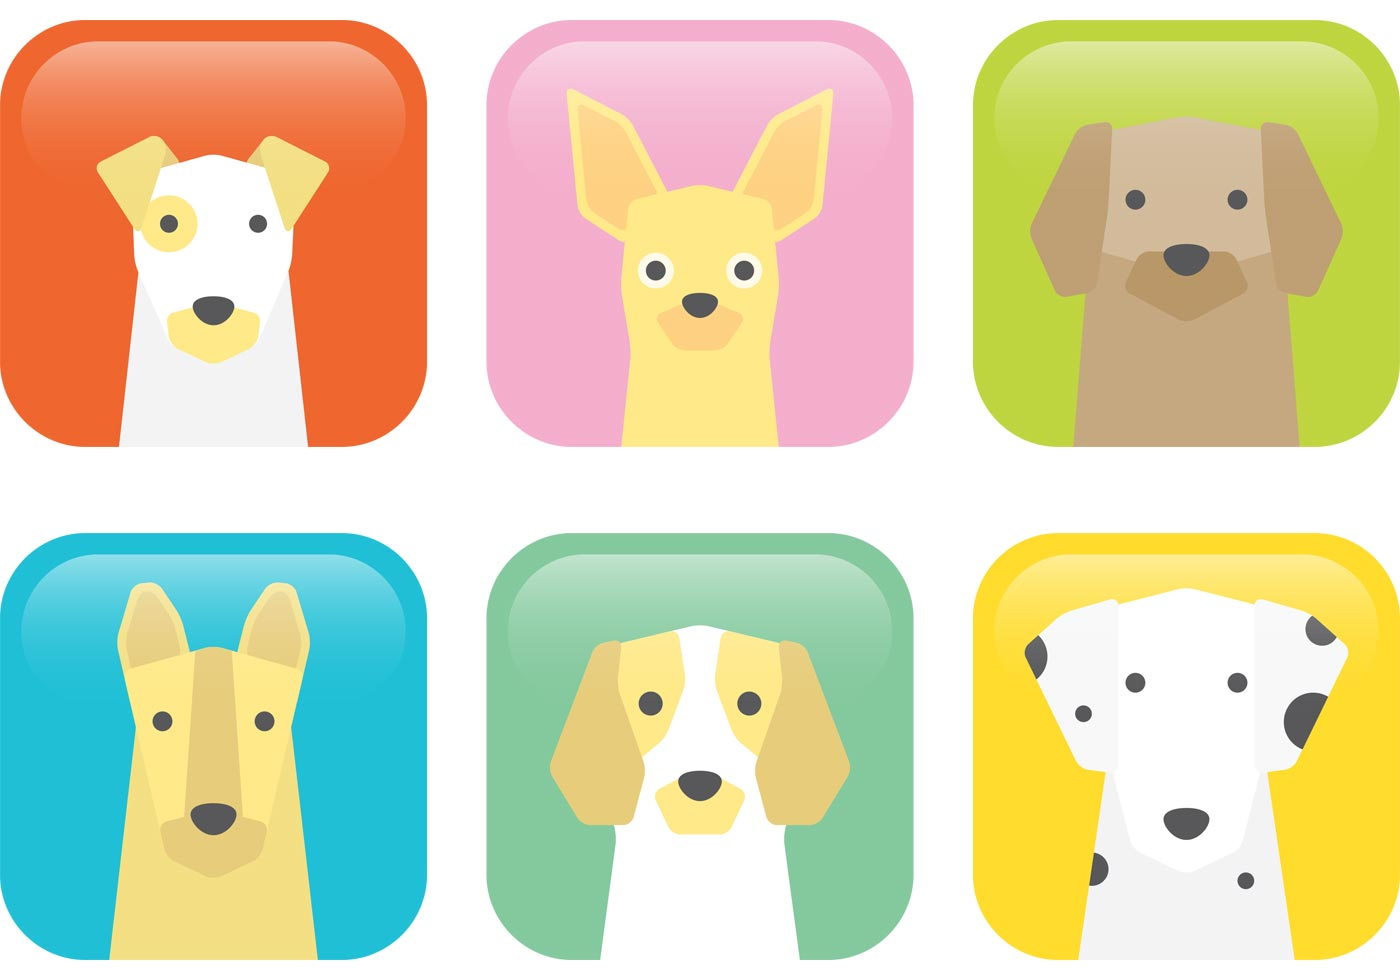 Black dog forex system free download